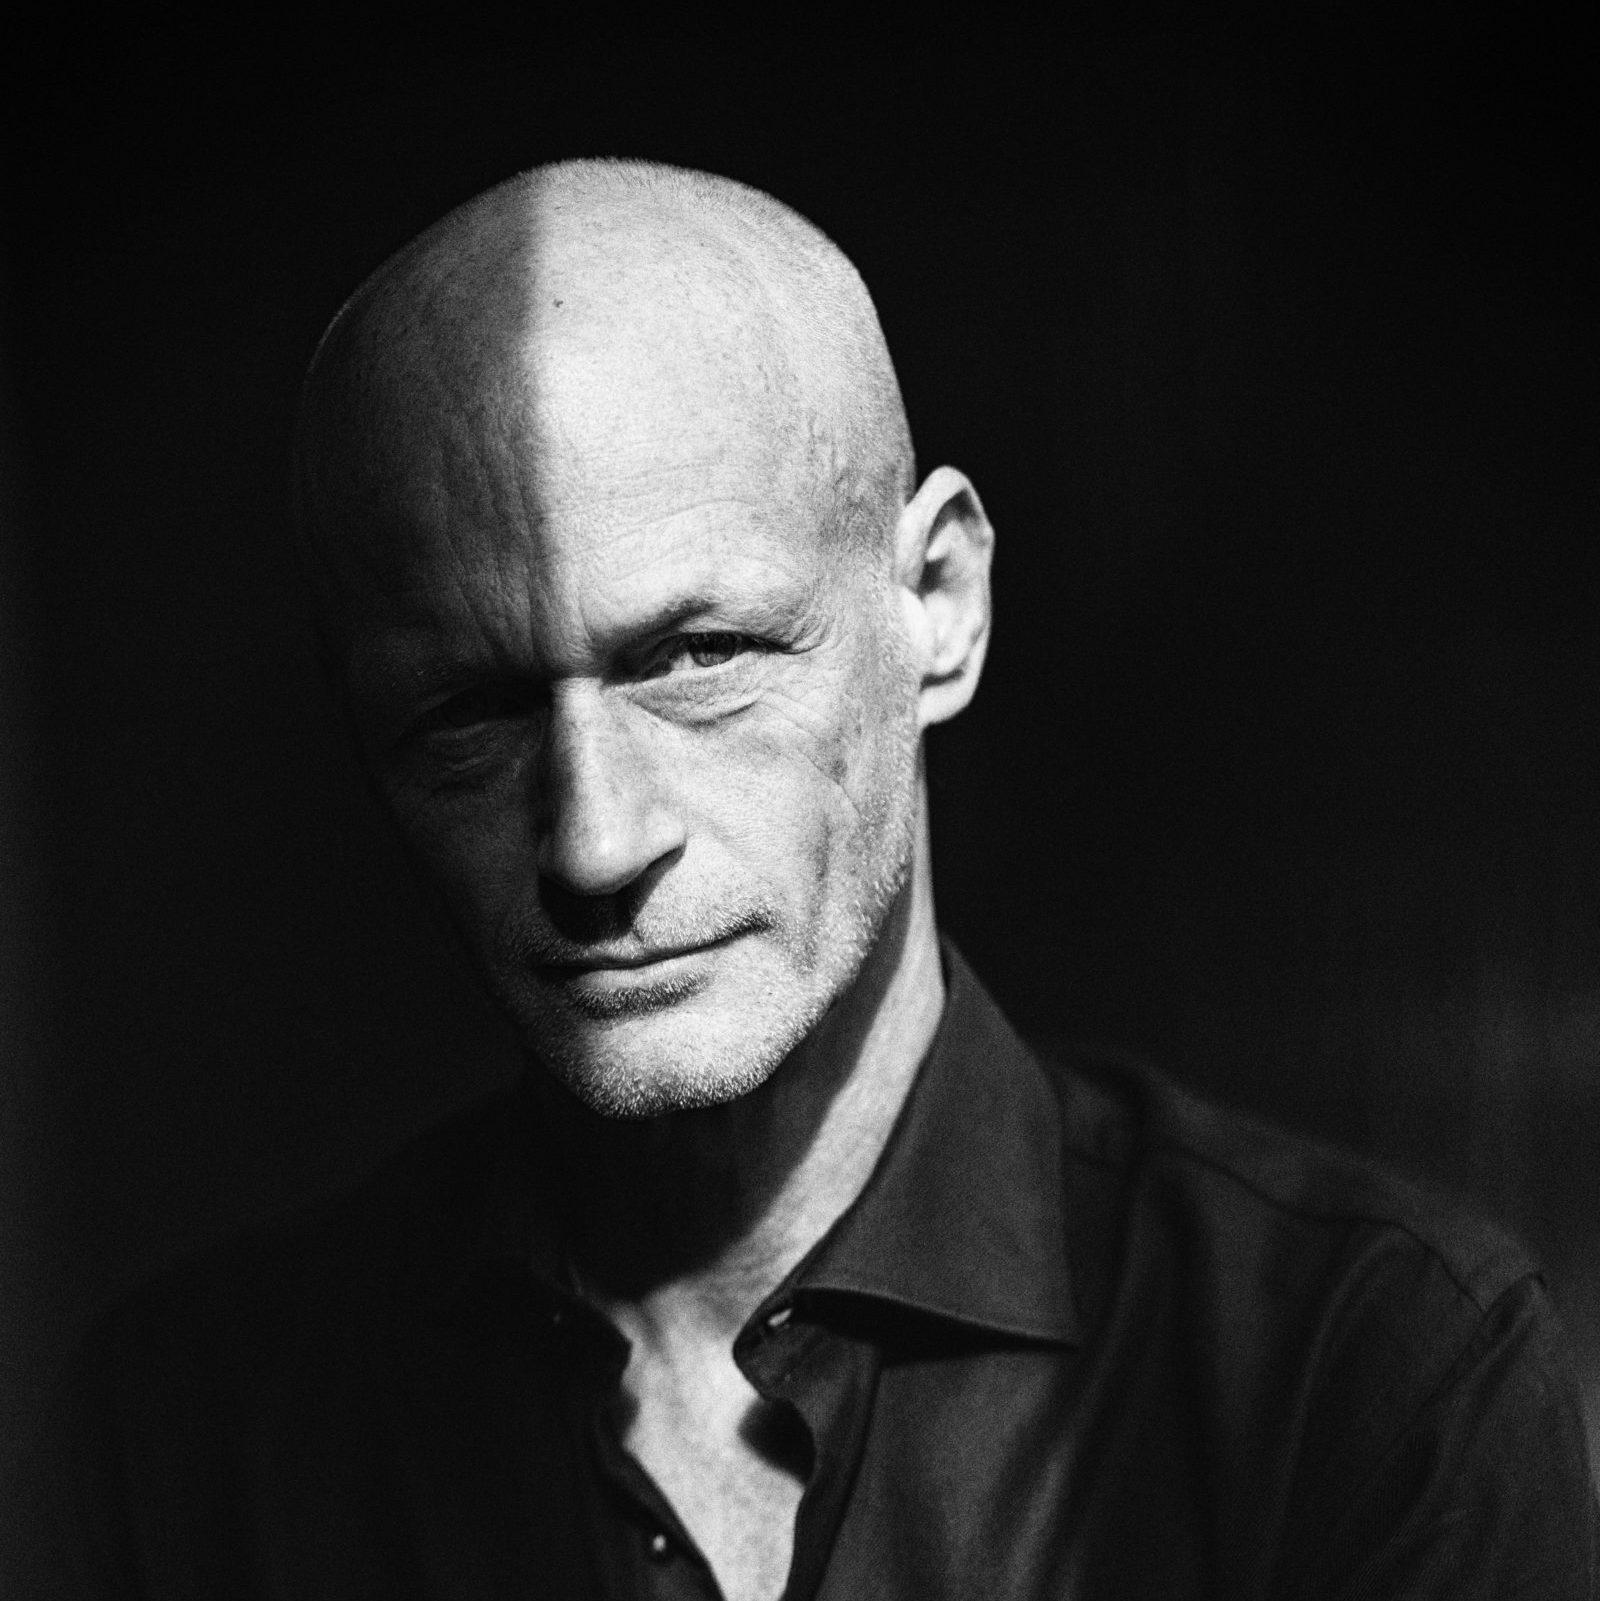 Gert-Jan van den Bemd